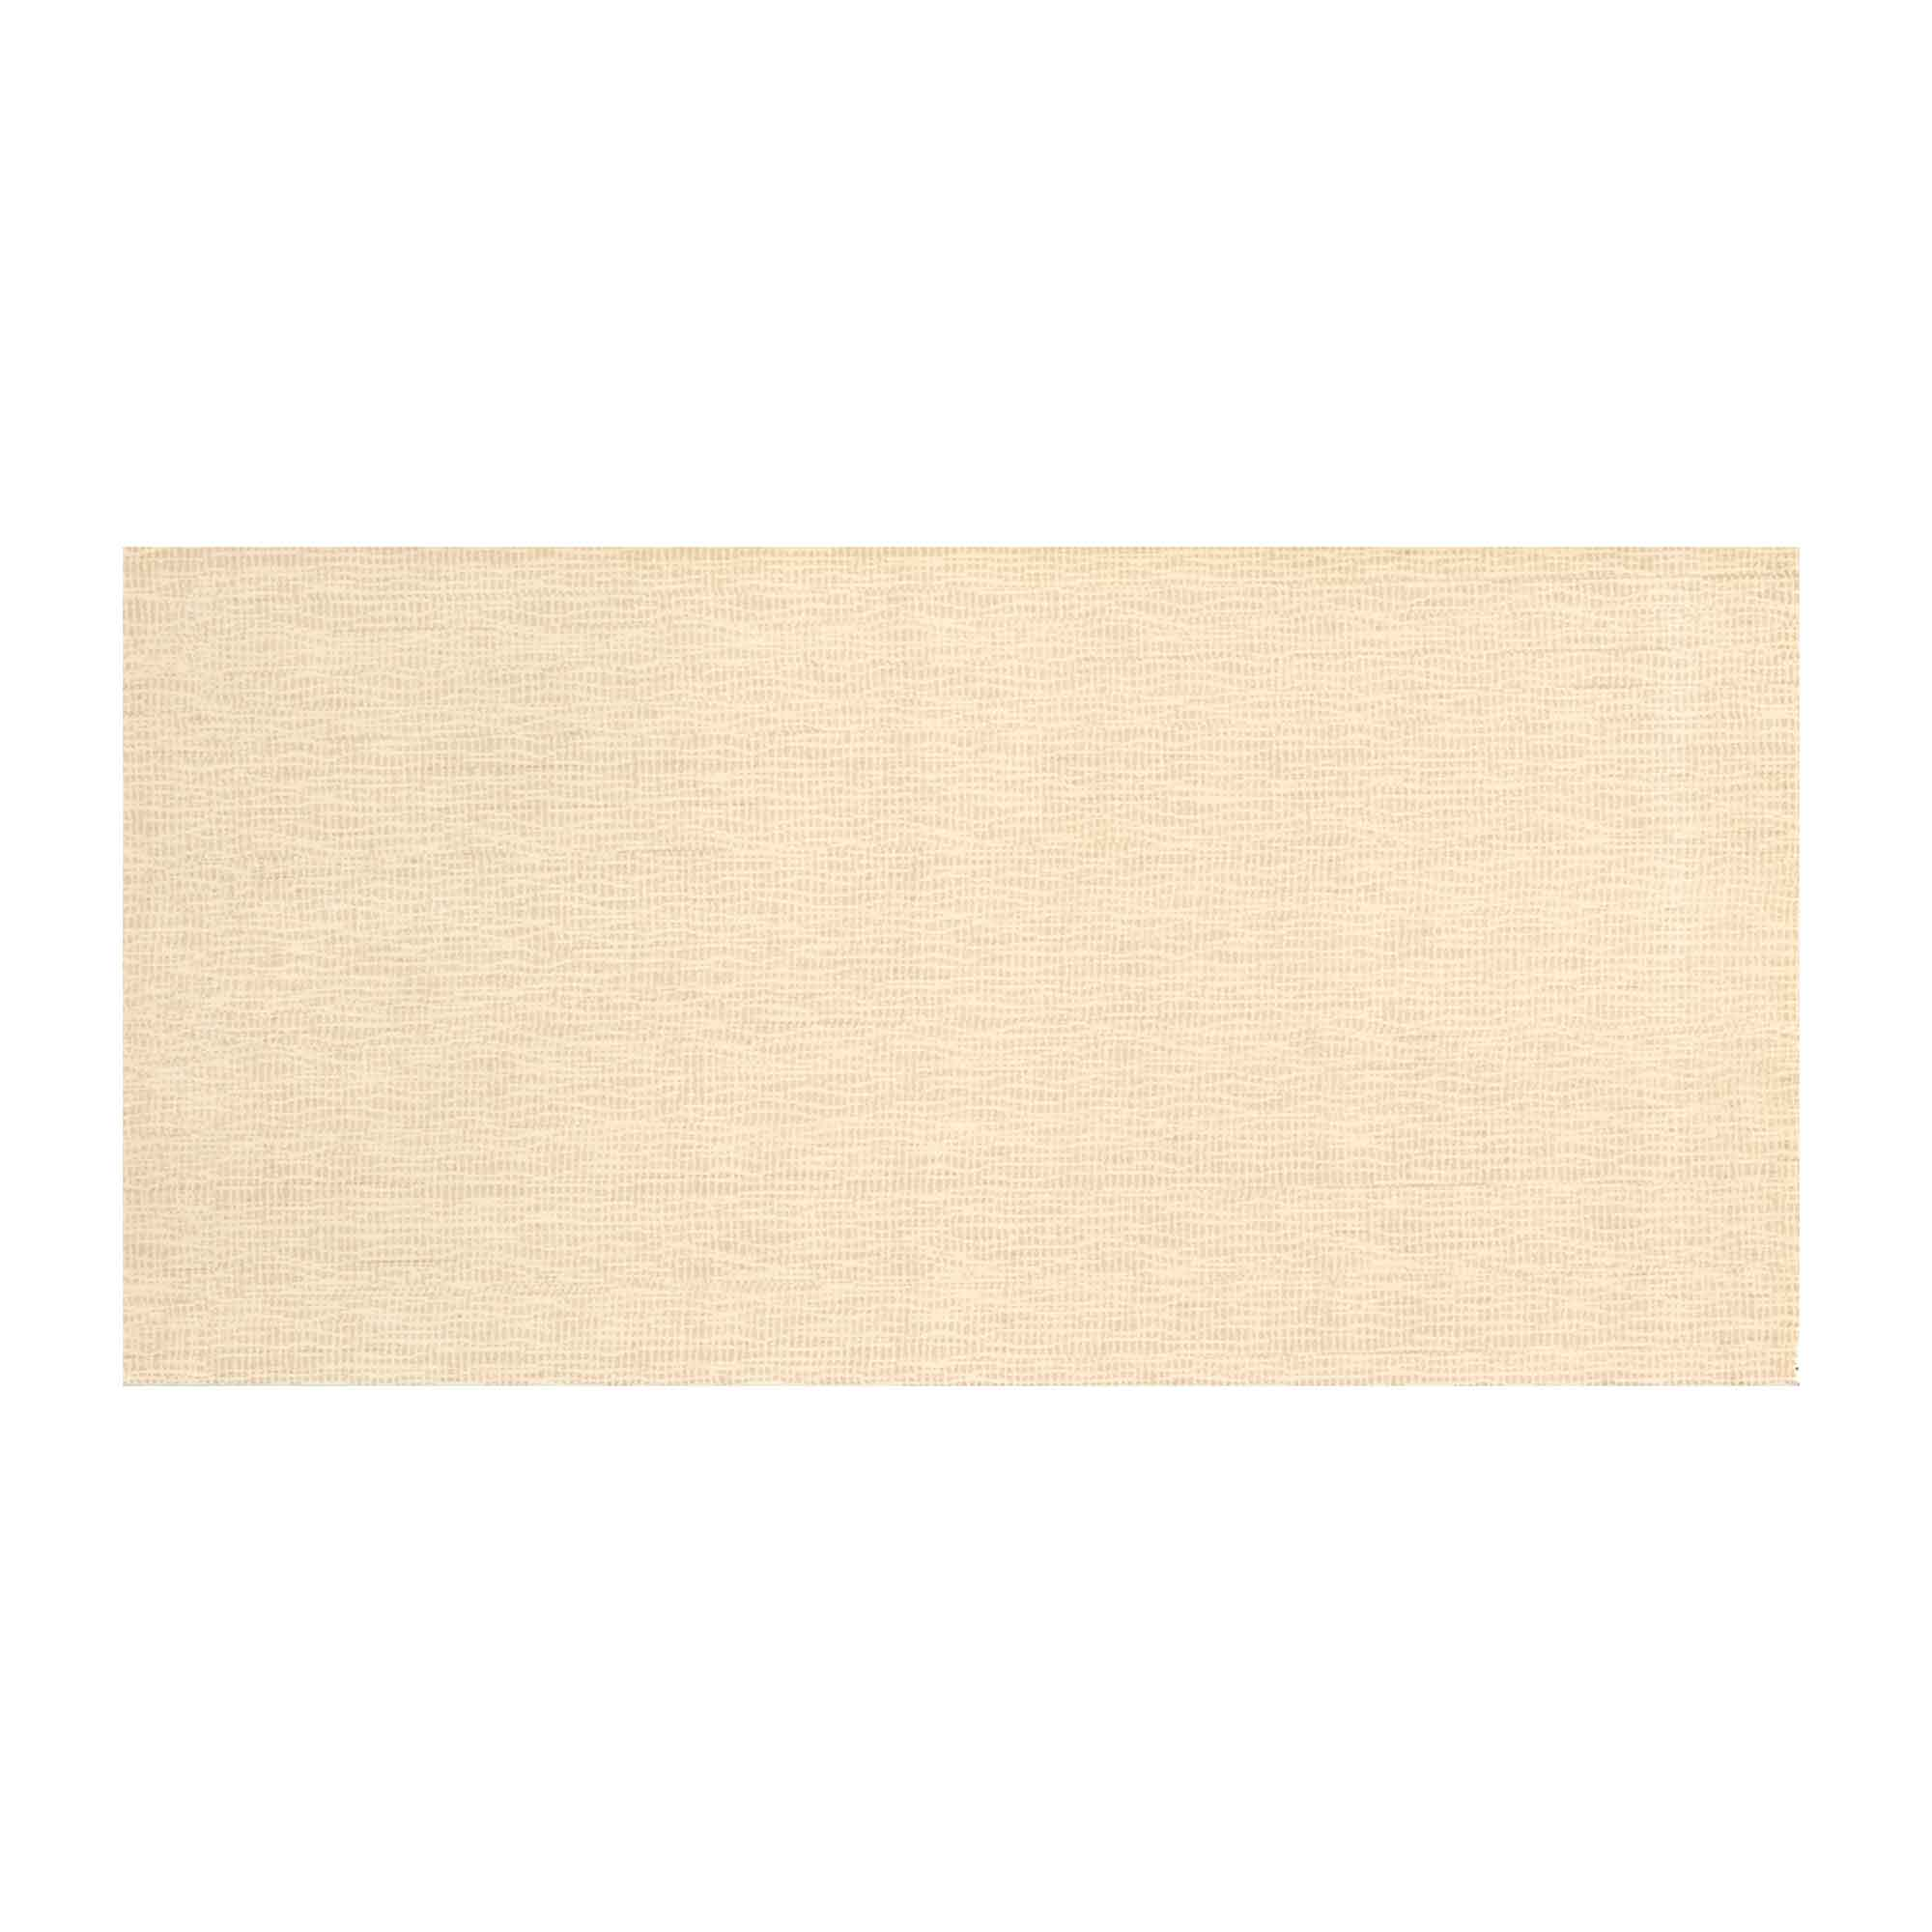 Faianta Cesarom Fabric bej, finisaj lucios, design textil, 40,2 x 20,2 cm mathaus 2021